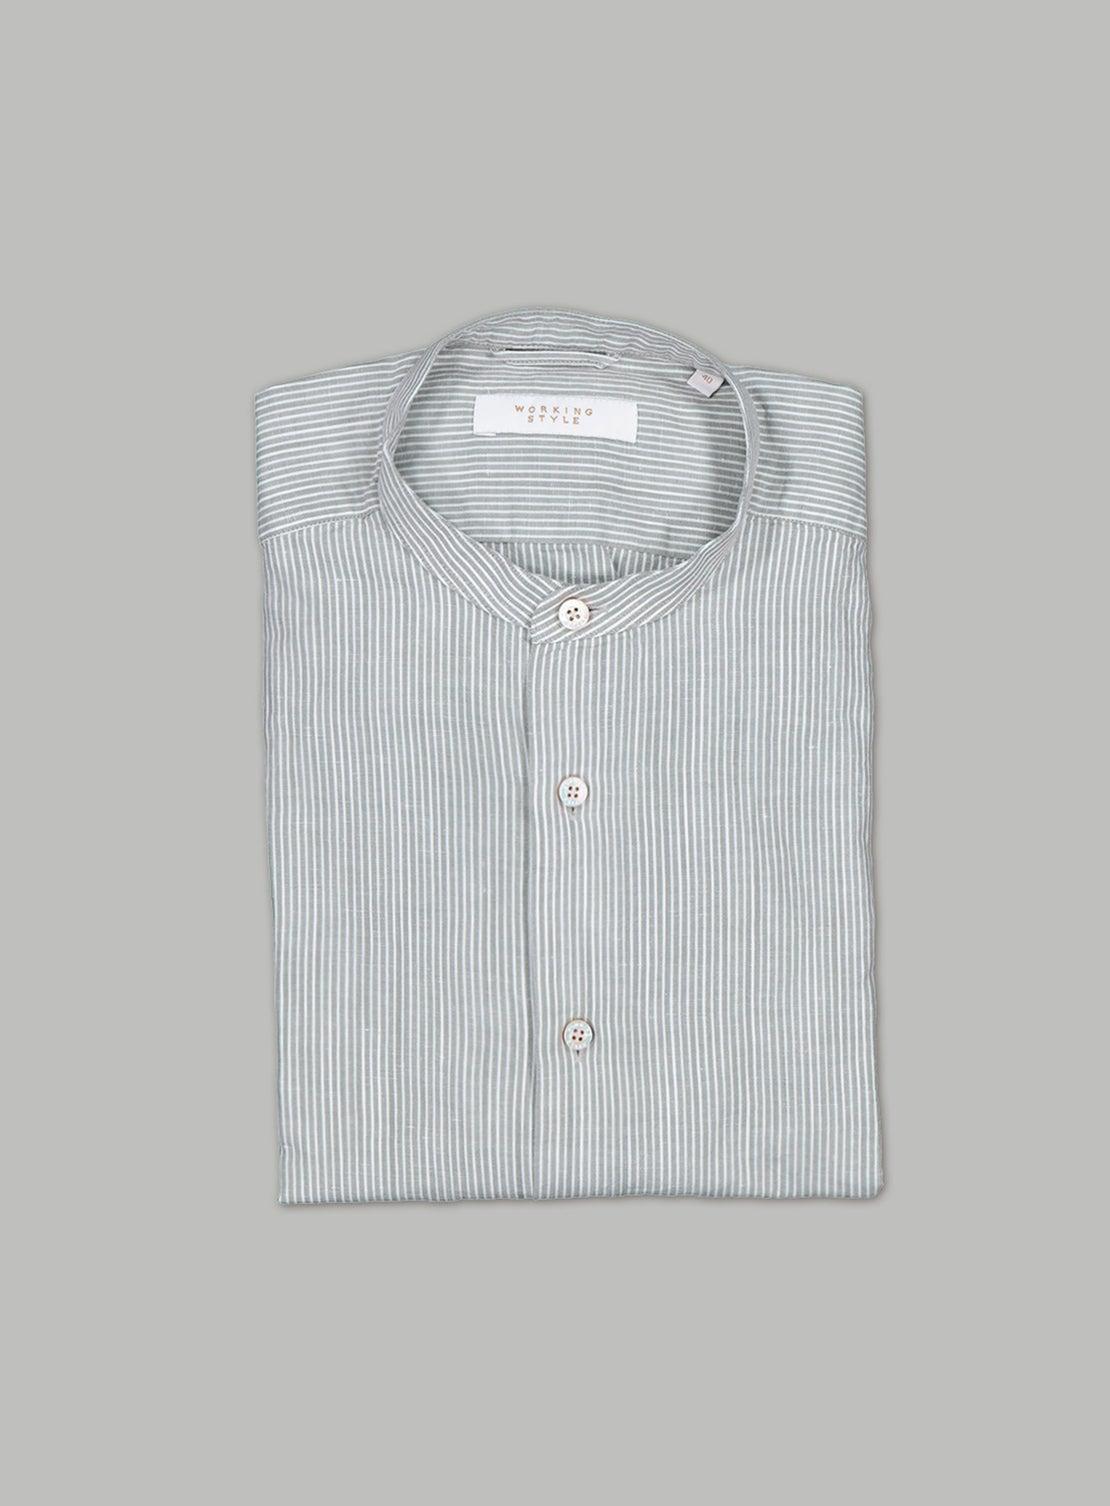 Olive Green Stripe Slub Shirt